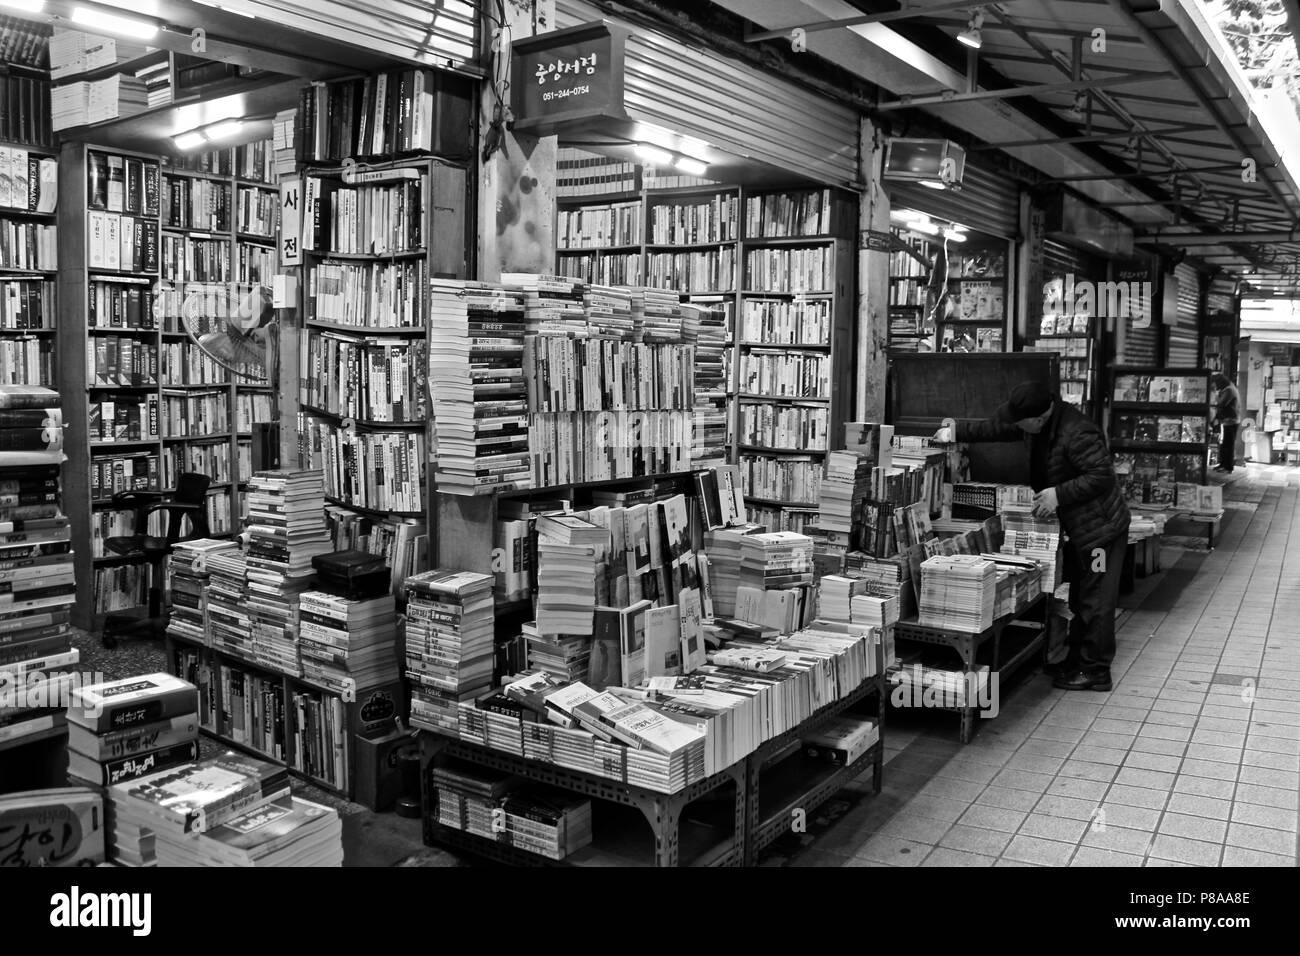 Bosu book street - Stock Image